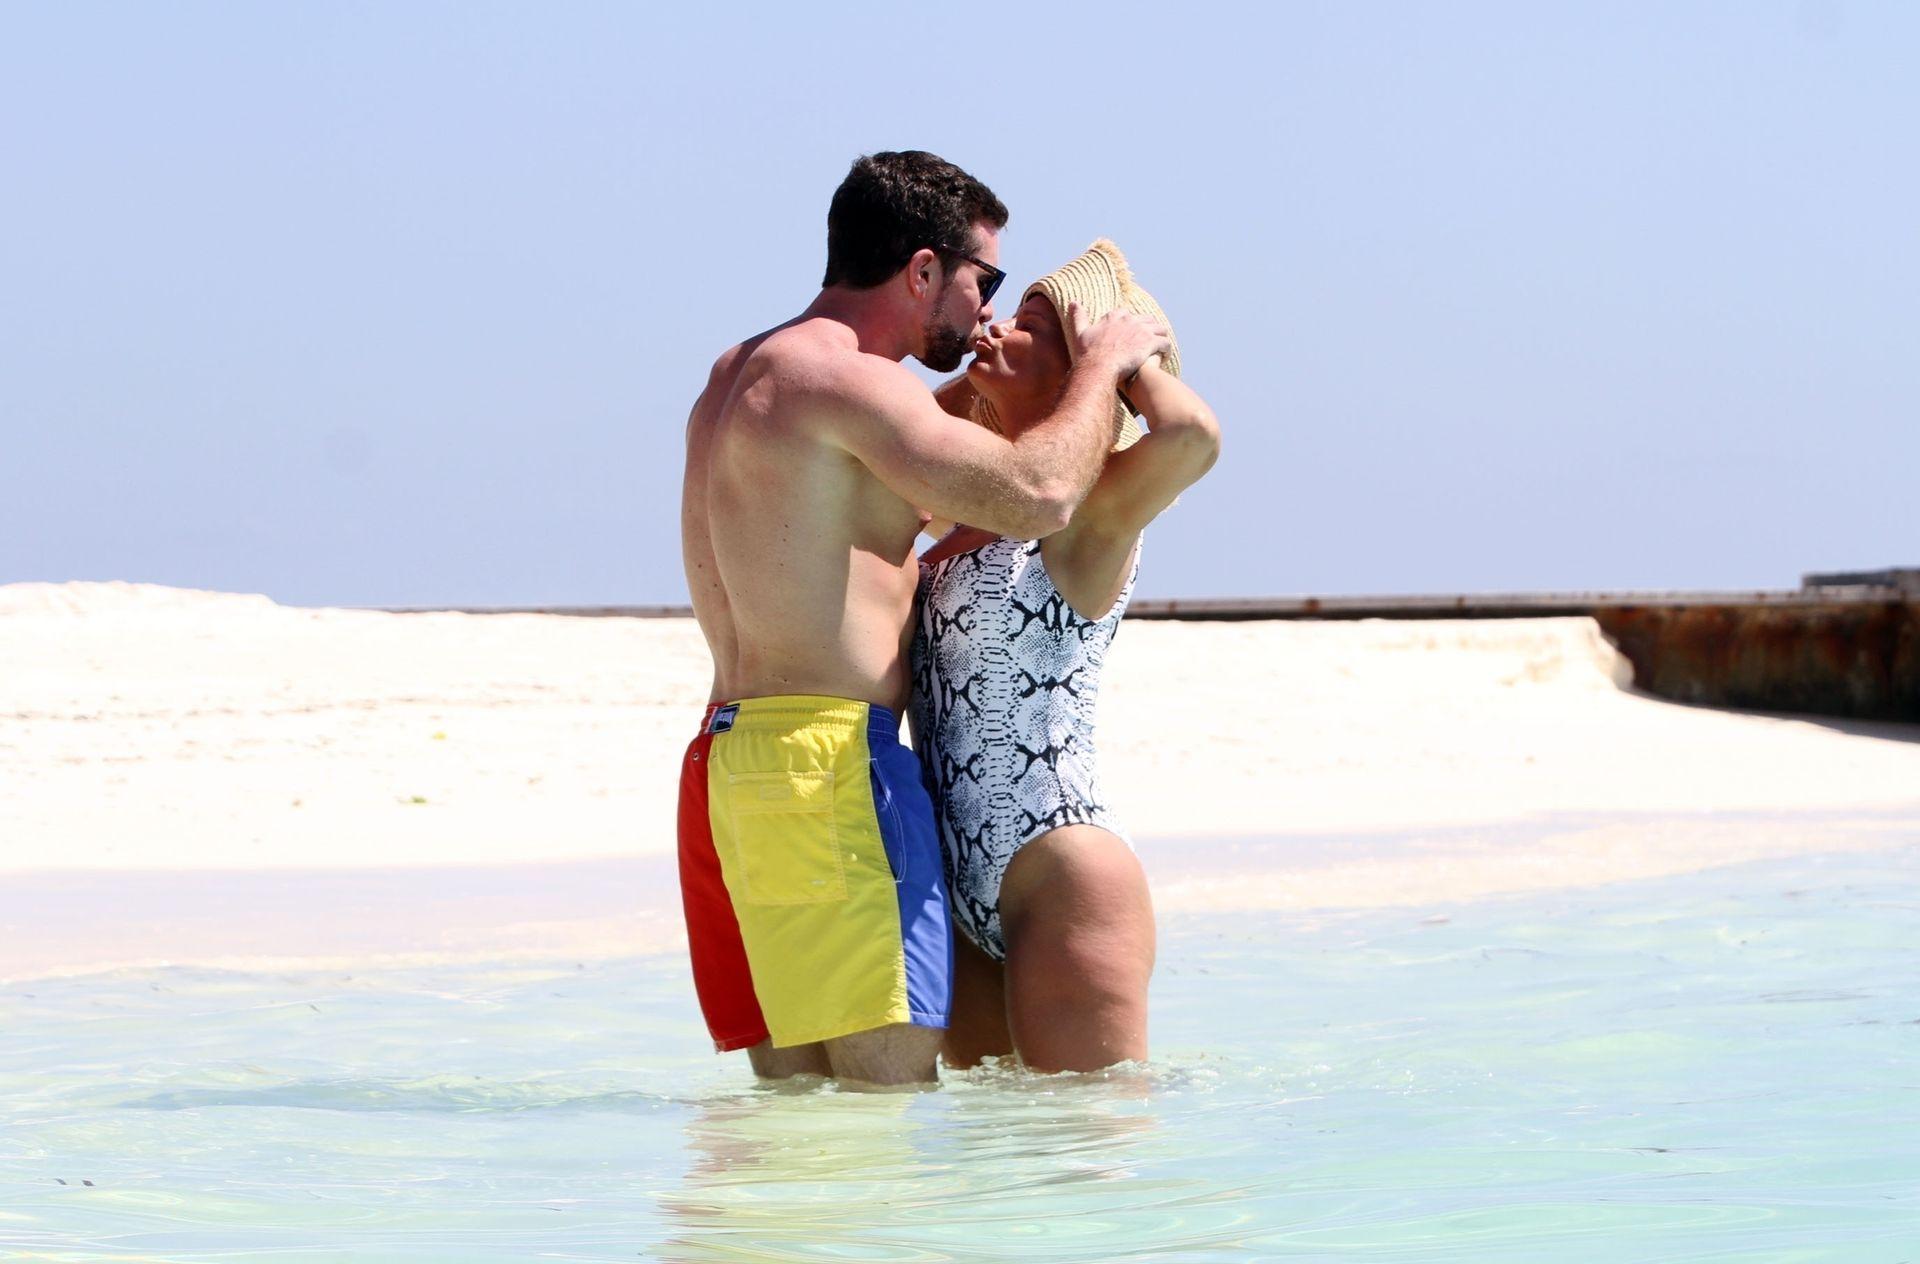 Kerry Katona & Ryan Mahoney Hit The Beach On Holiday At Their Luxury 5 Star Resort Ayada Maldives 0022